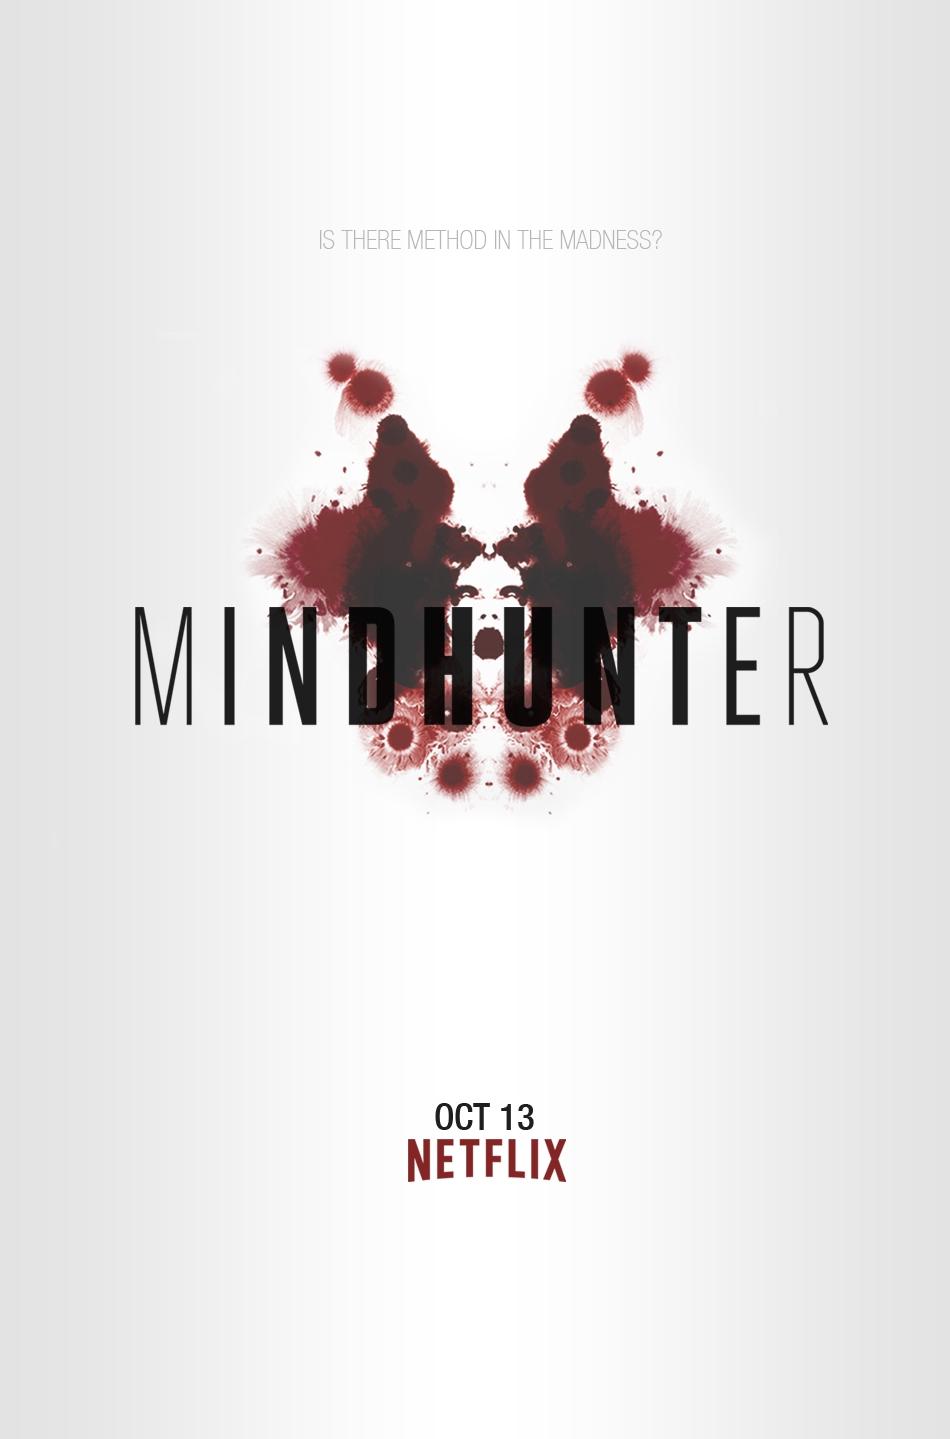 mindhunter-season-1-2017-netflix-poster.jpg